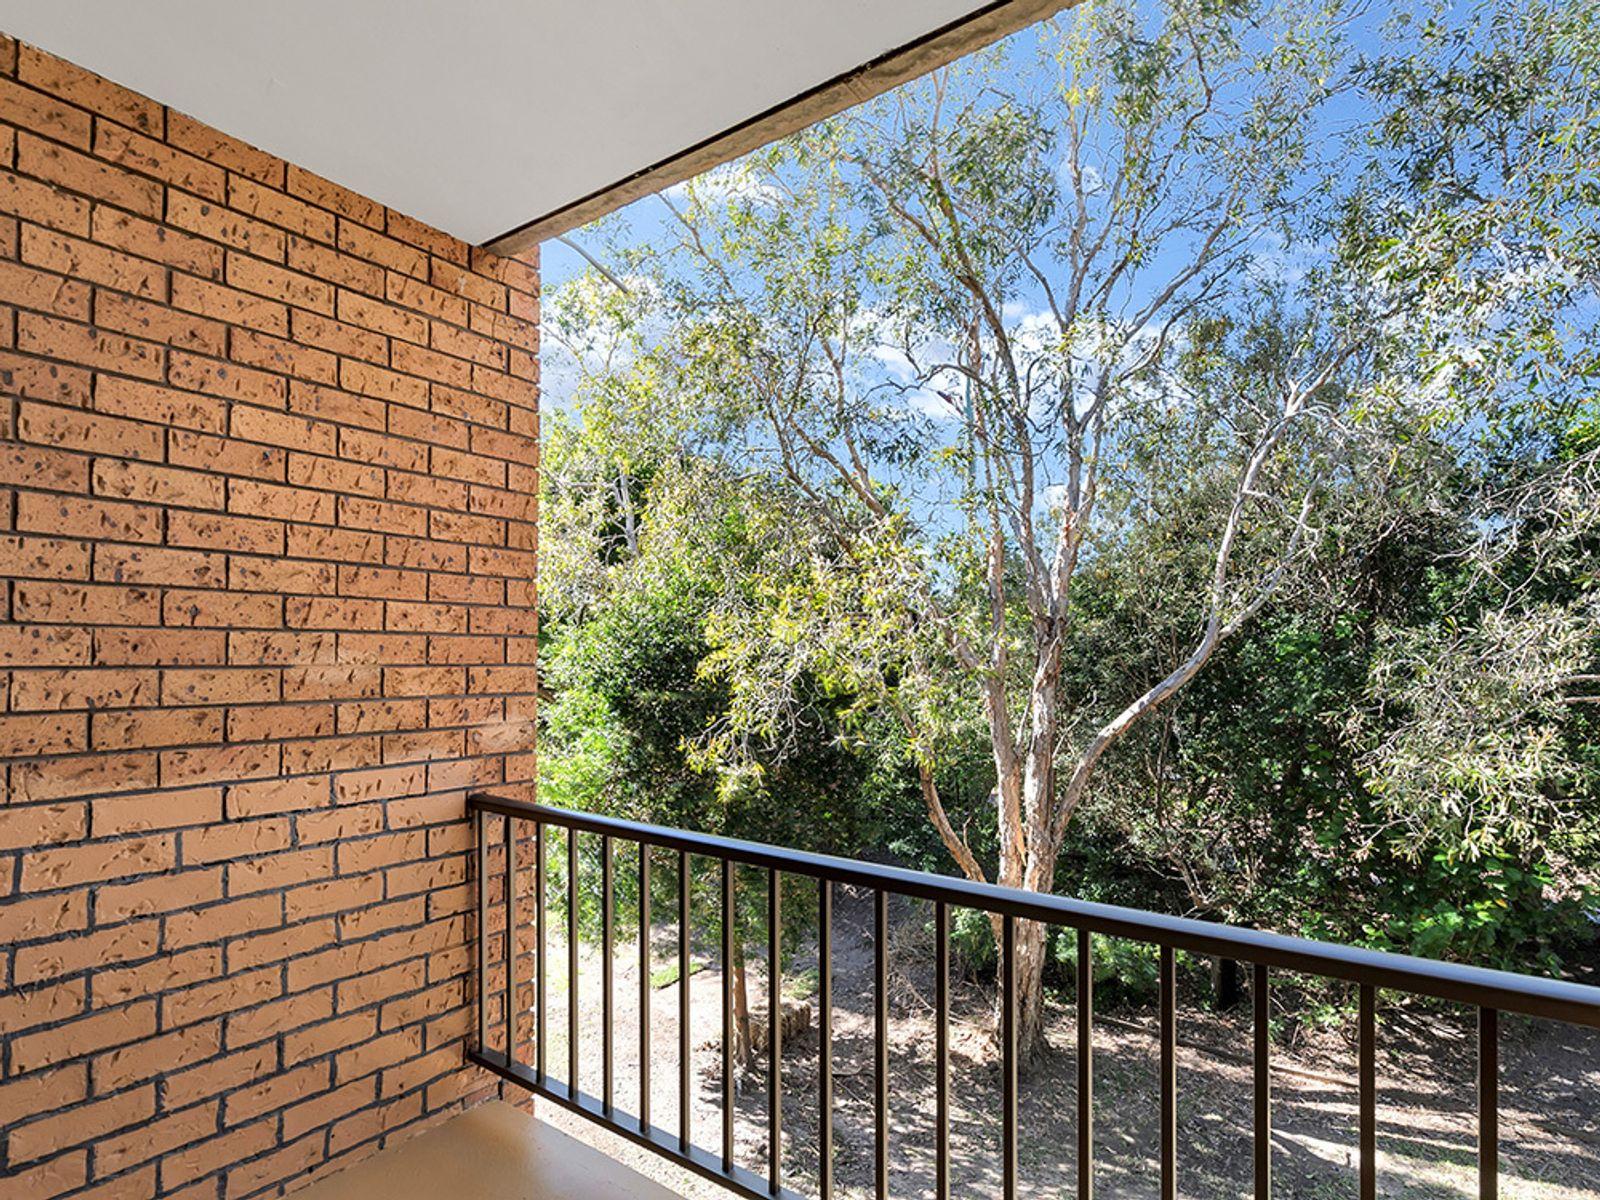 13/28 Fitzgerald Street, Coffs Harbour, NSW 2450